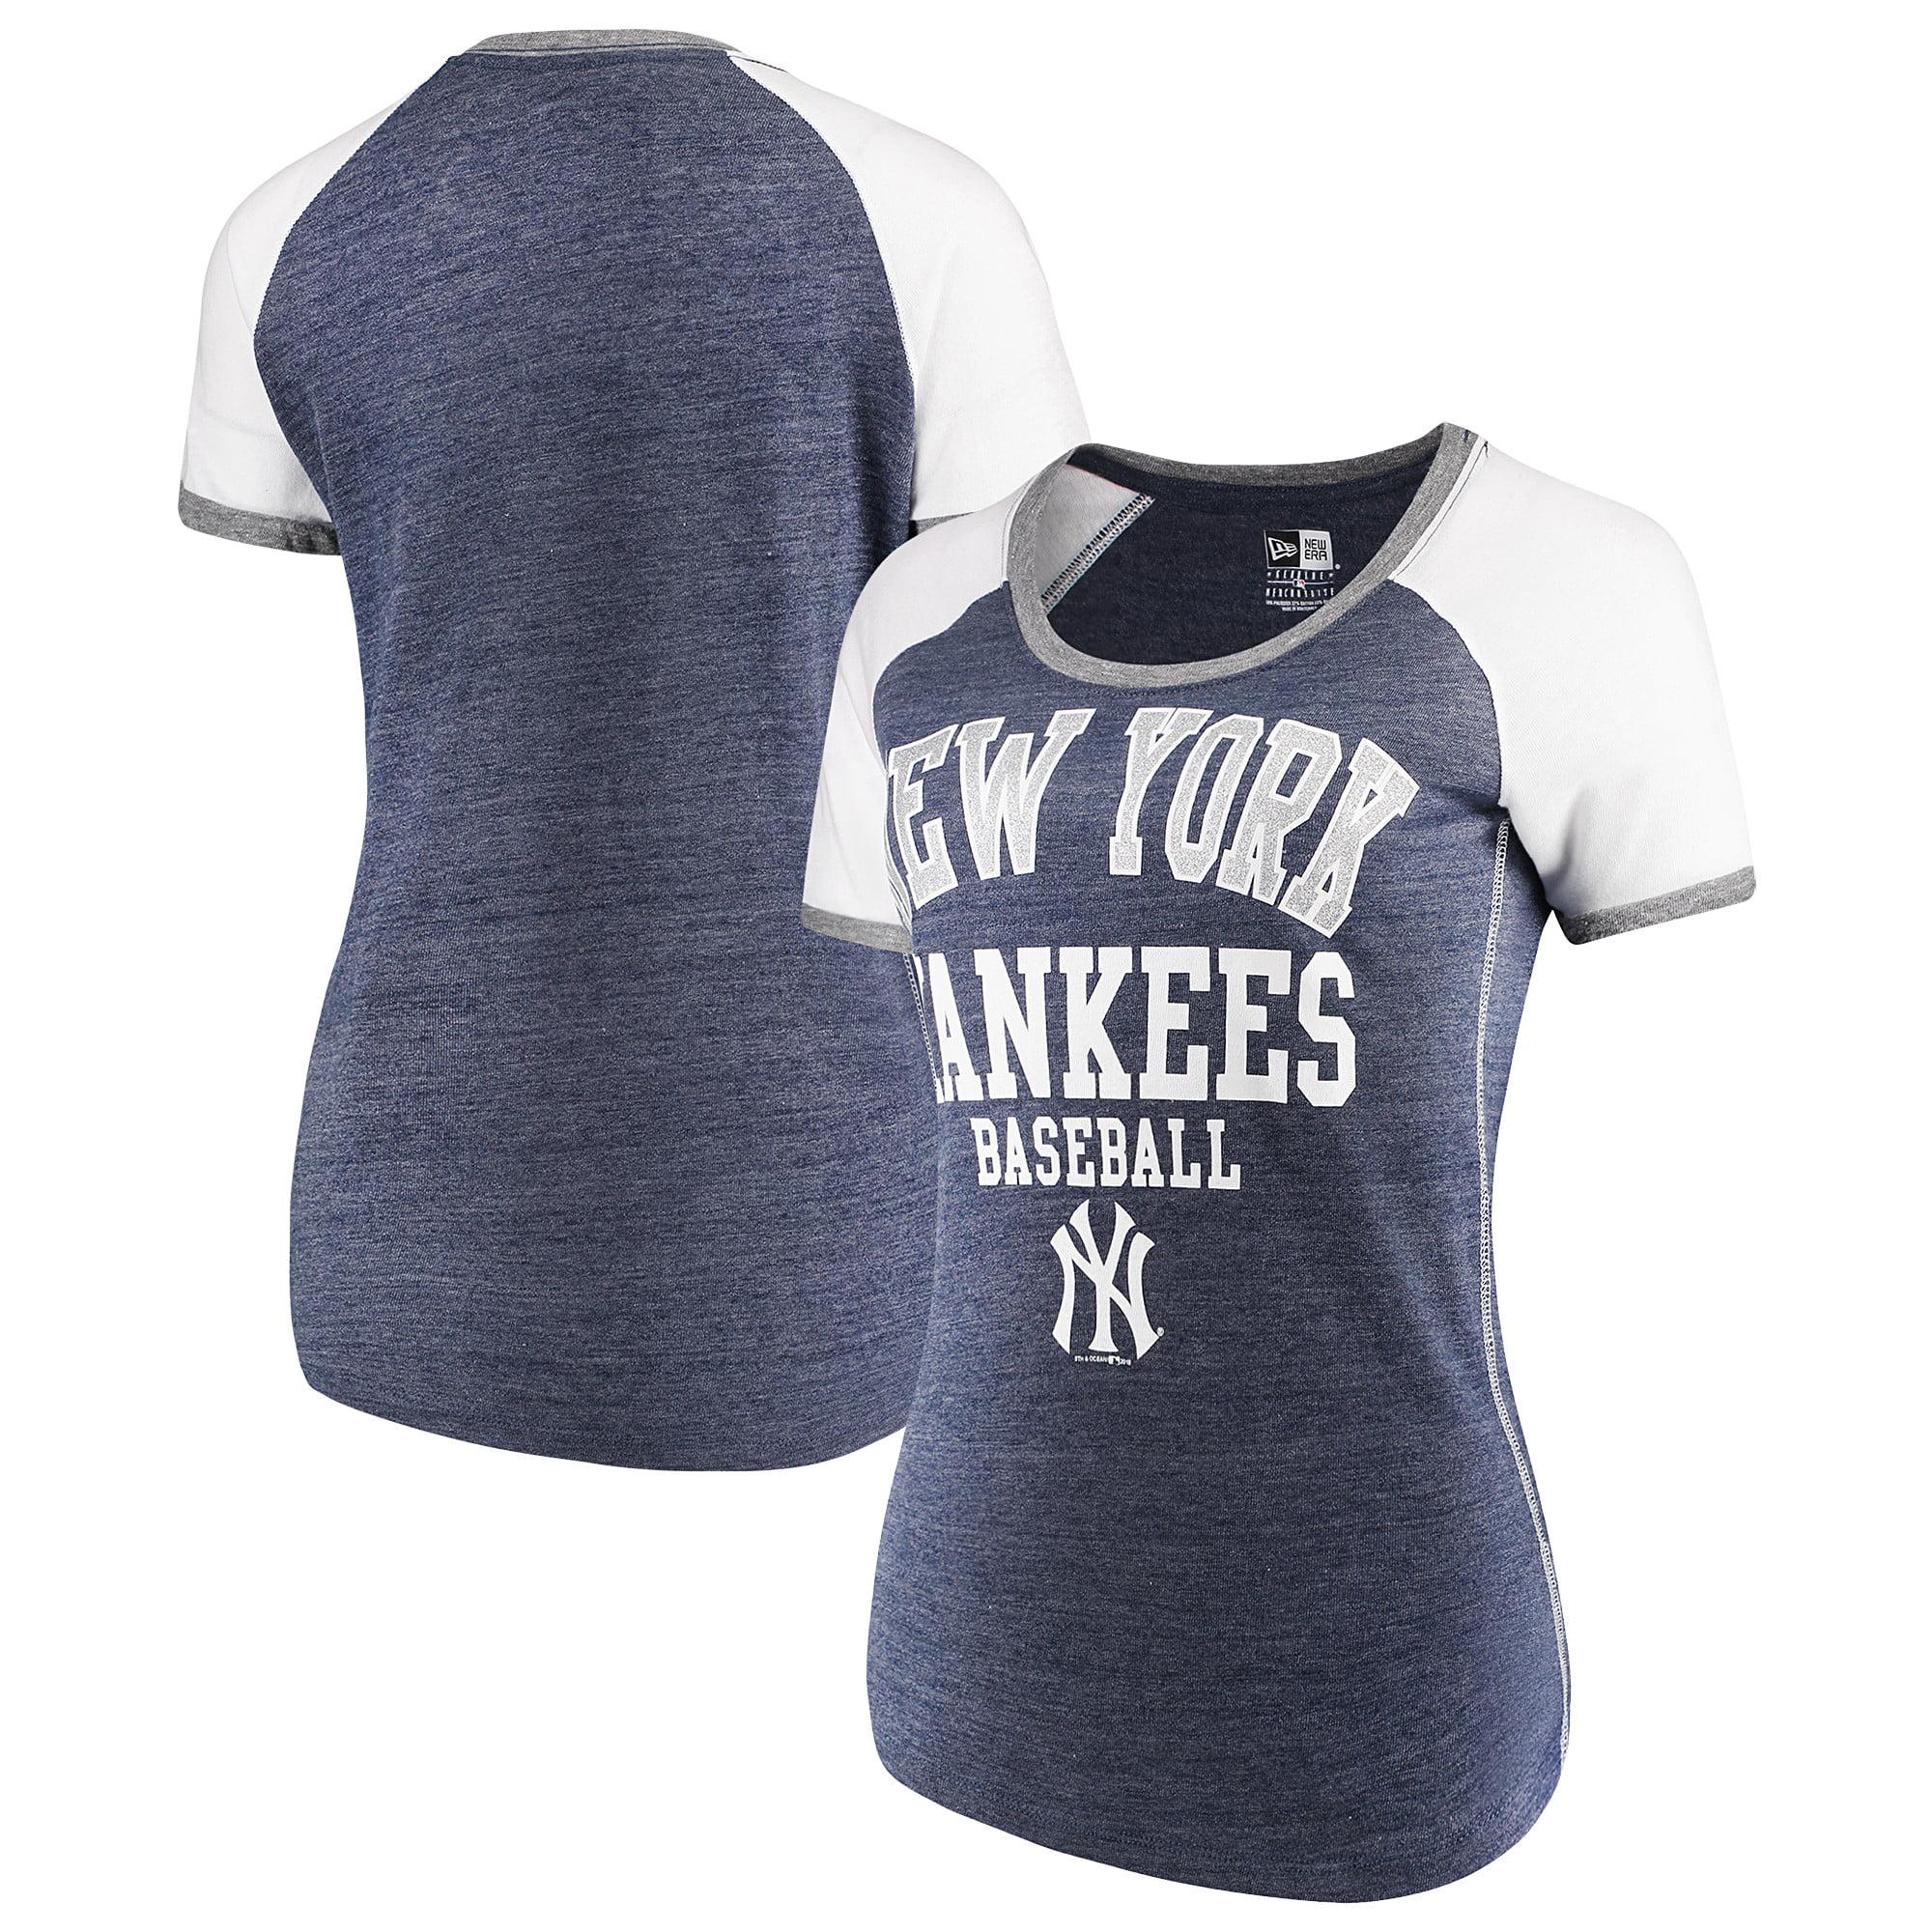 New York Yankees 5th & Ocean by New Era Women's Jersey Tri-Blend Raglan T-Shirt - Navy